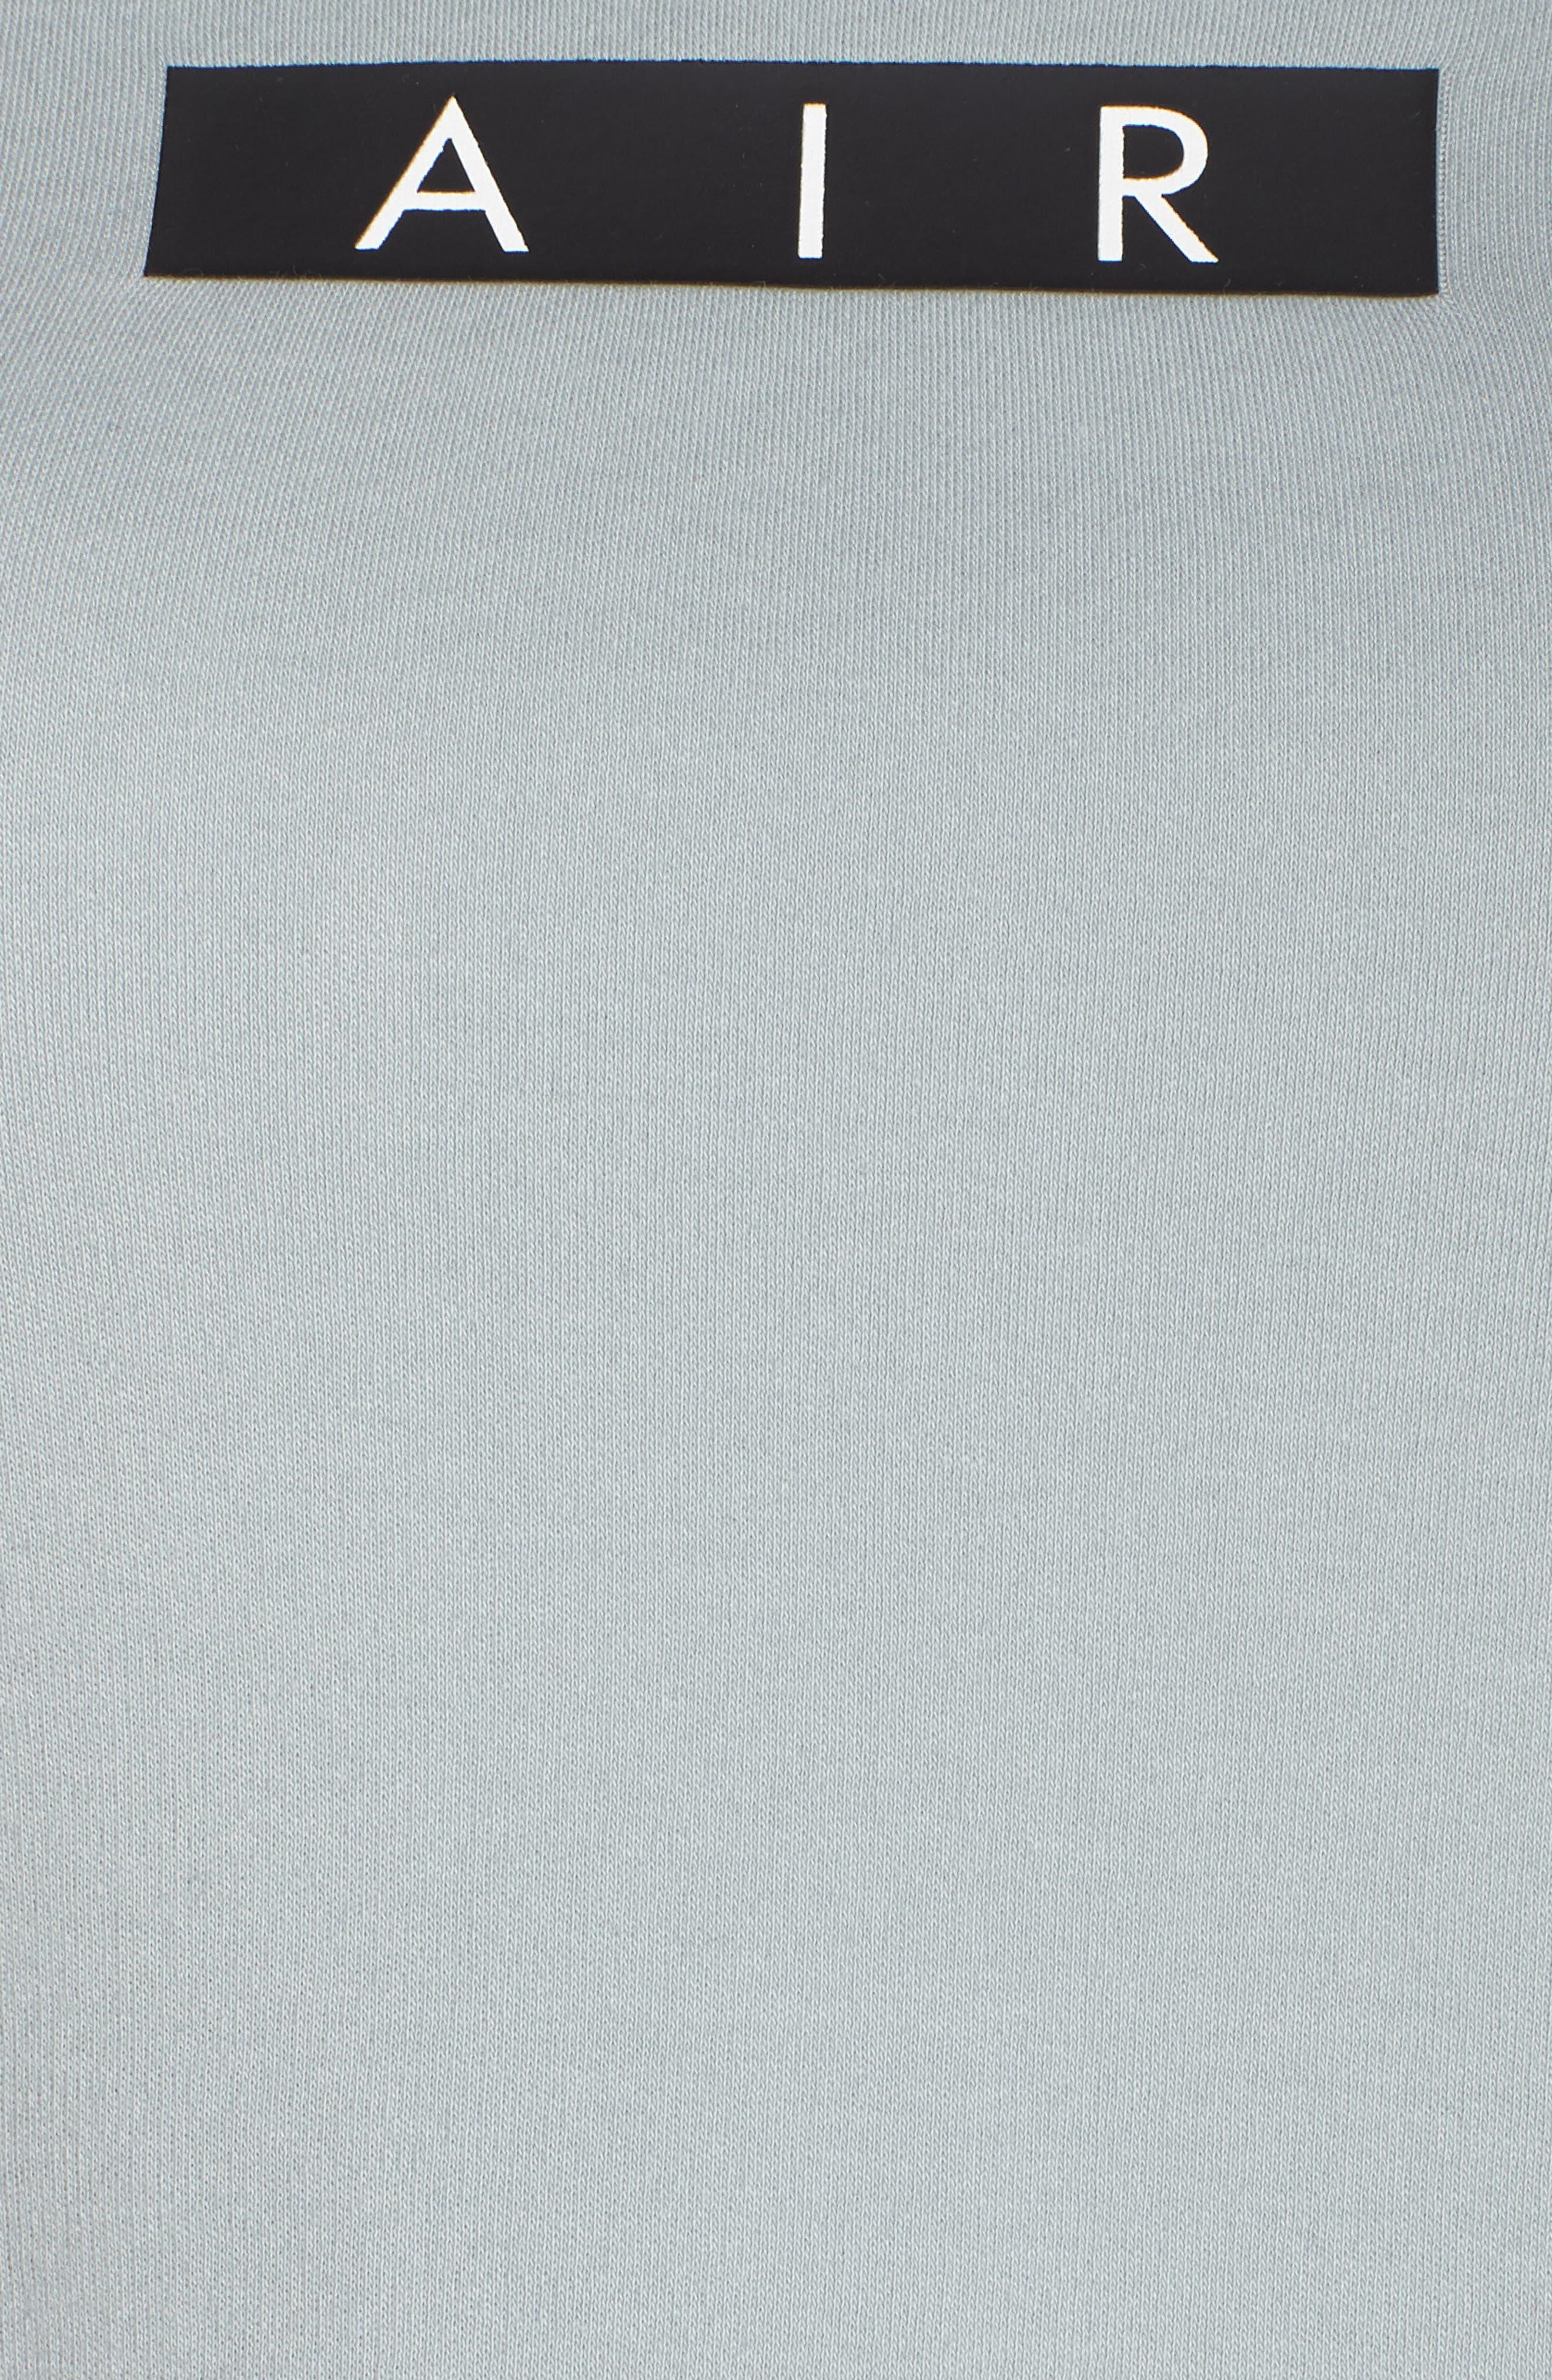 Sportswear Baby Air Crop Tee,                             Alternate thumbnail 8, color,                             LIGHT PUMICE/ BLACK